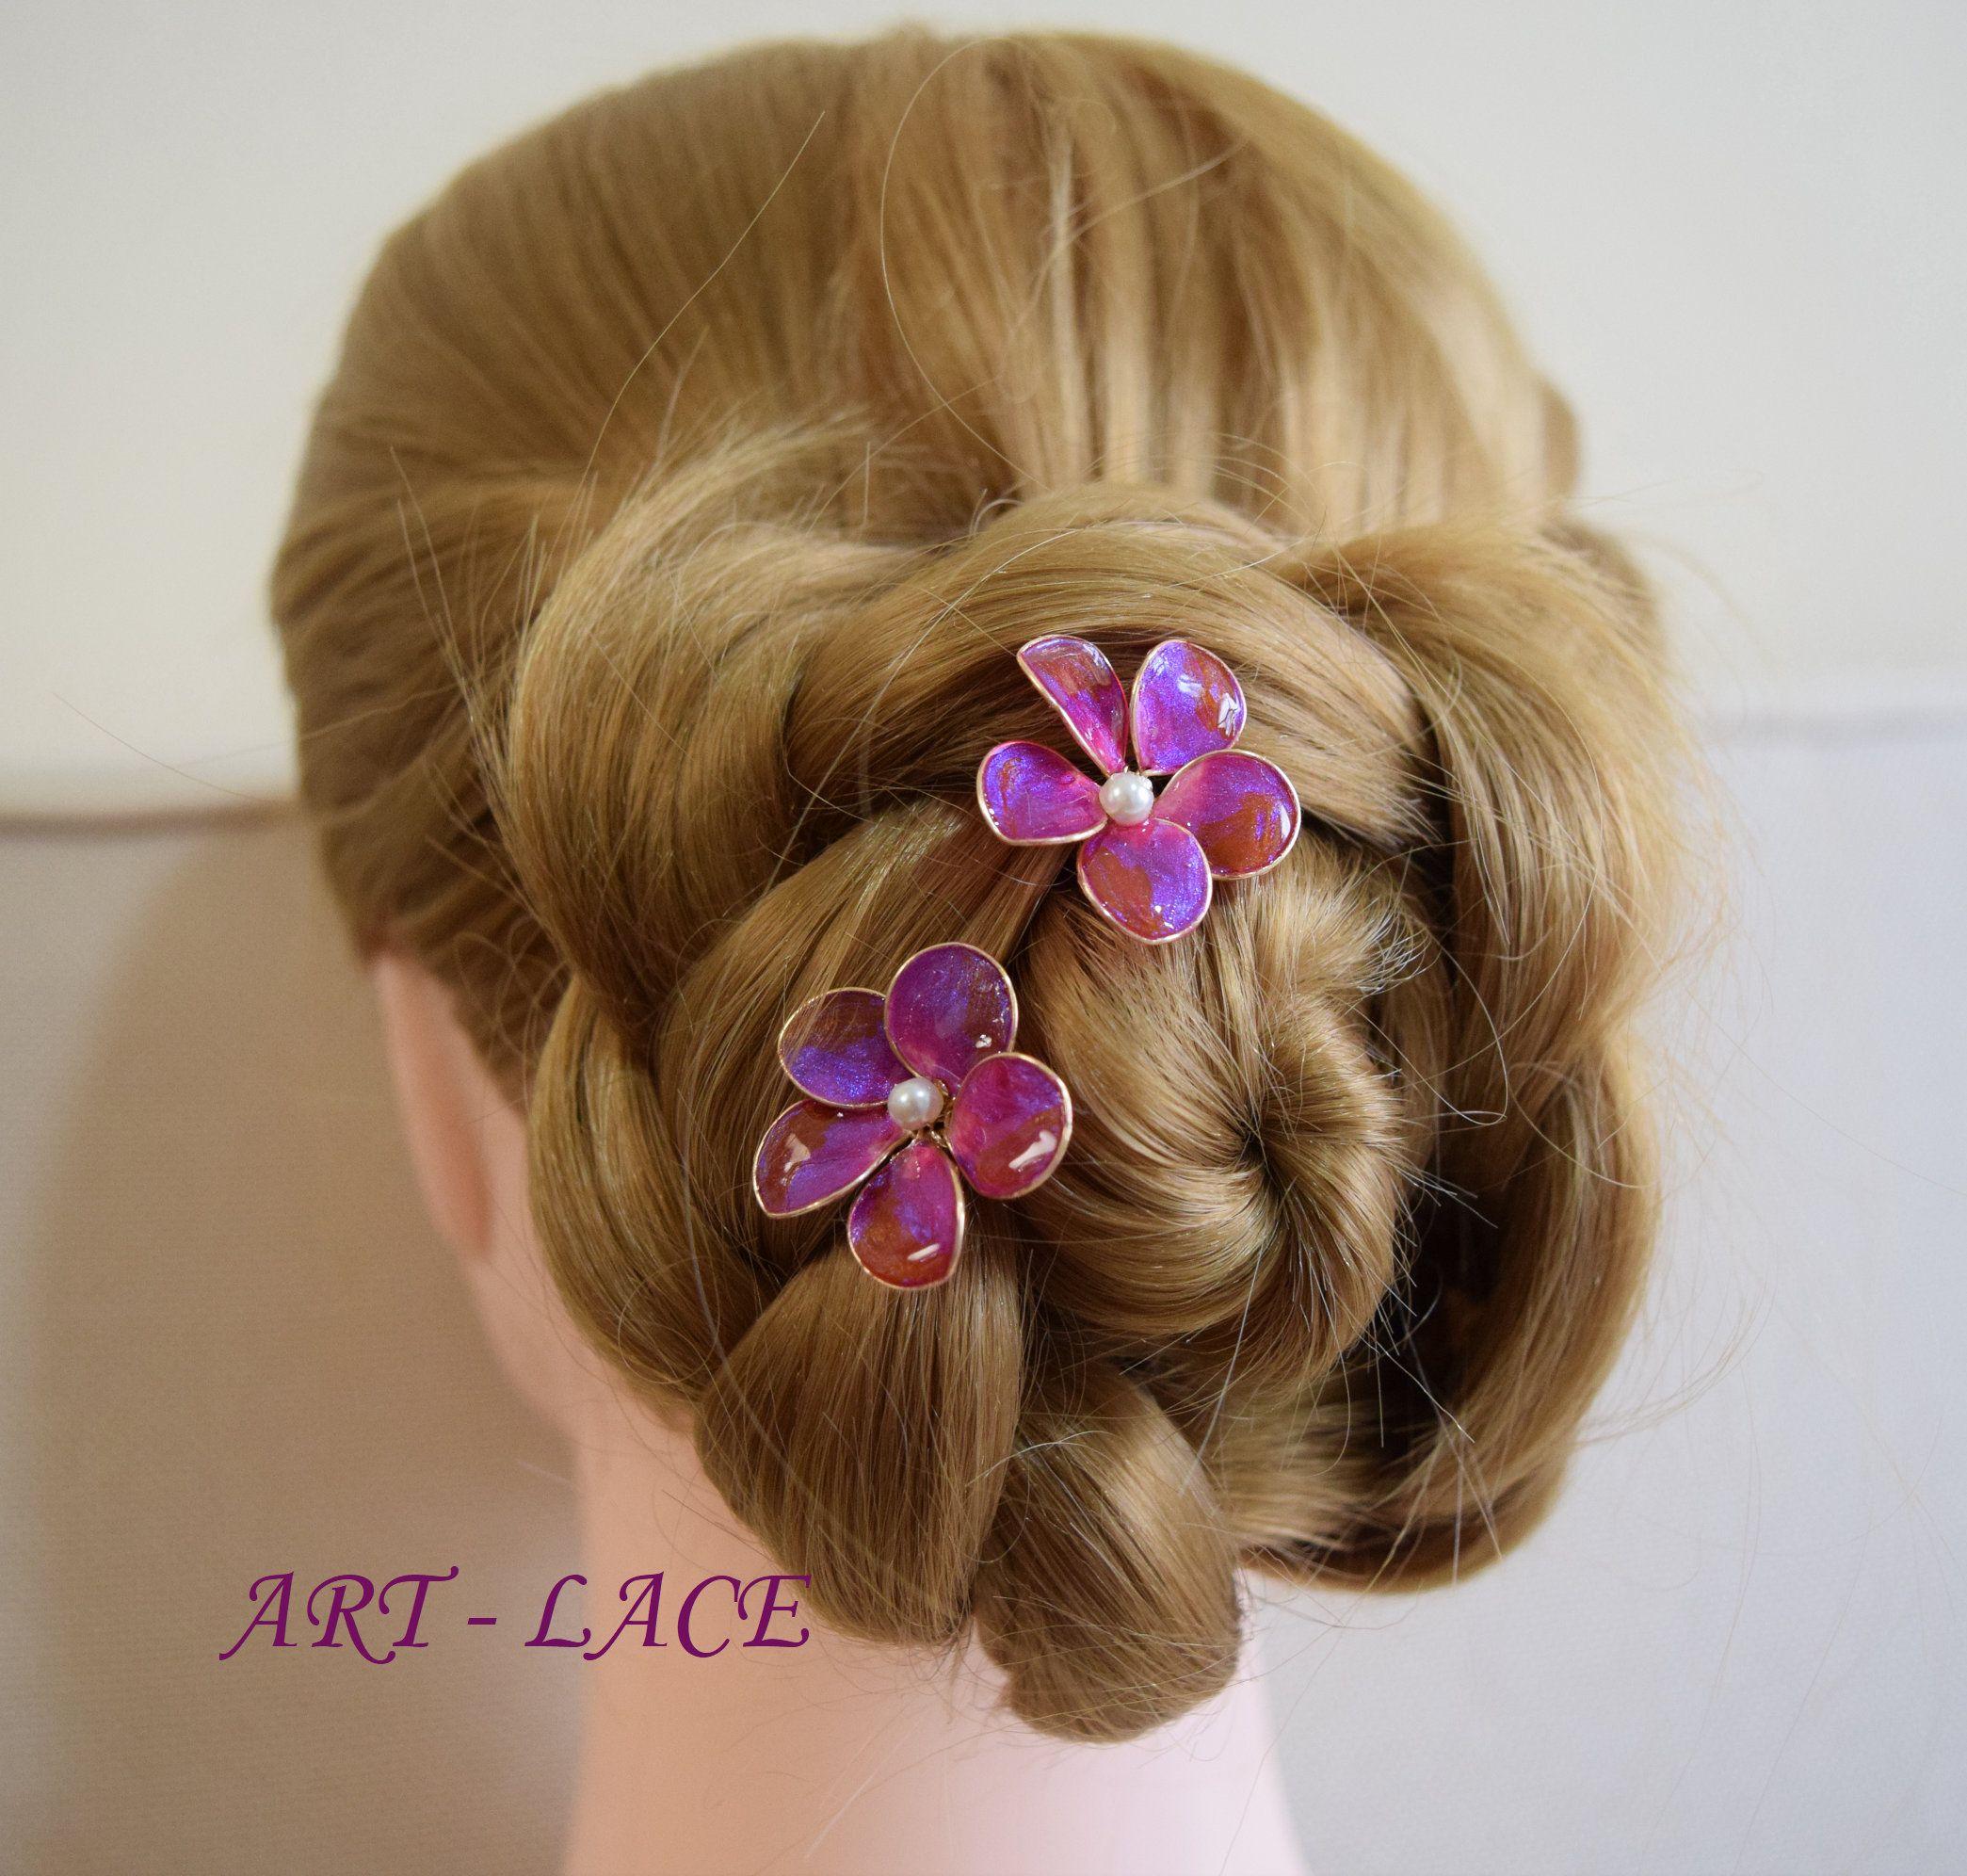 Hawaiian Wedding Hairstyles: Plumeria Hair Picks Megenta Bridal Flower Hair Sticks For